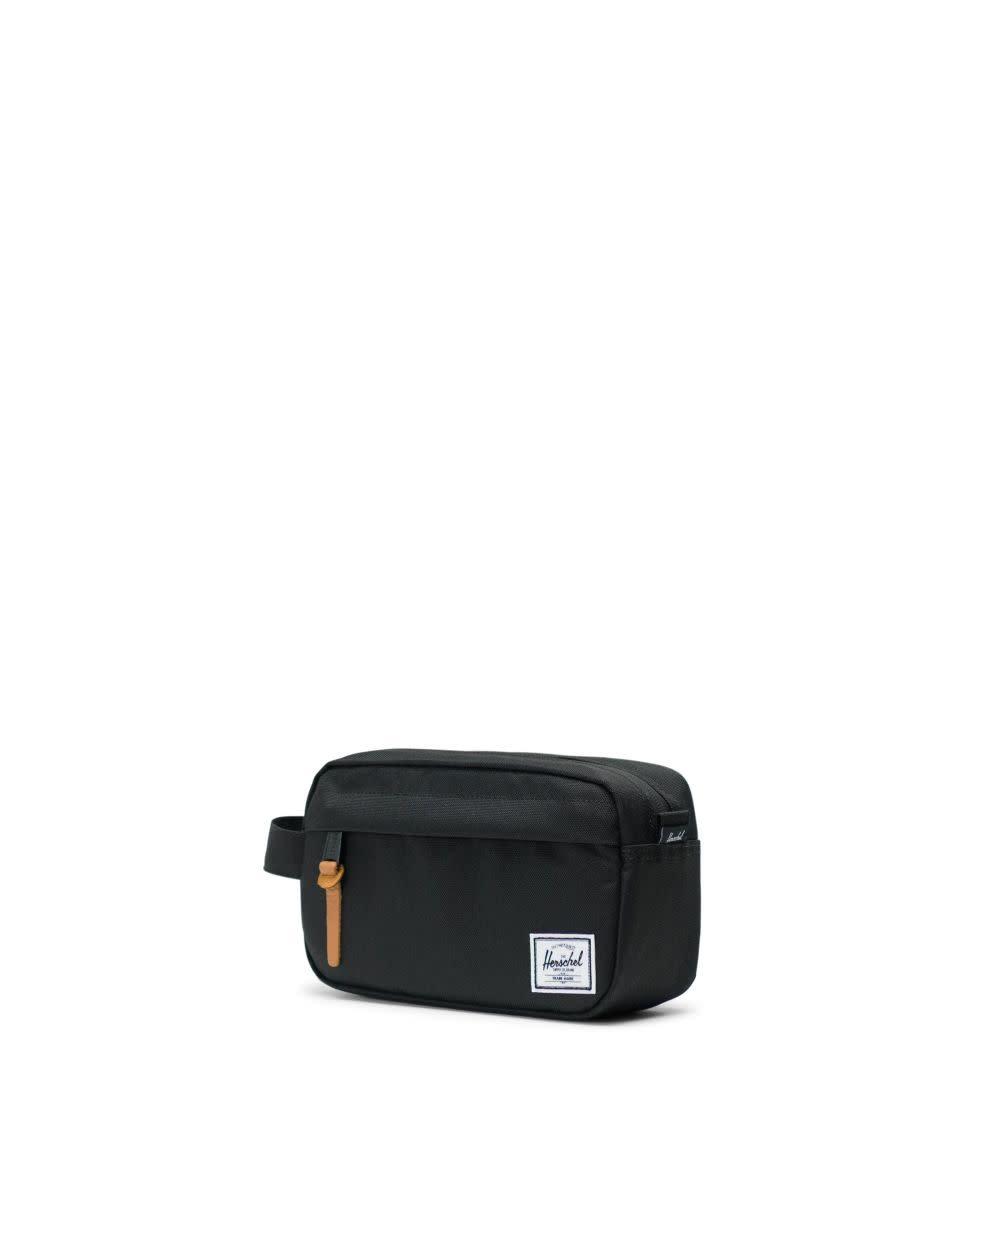 Herschel Herschel Chapter Travel Kit Carry-On